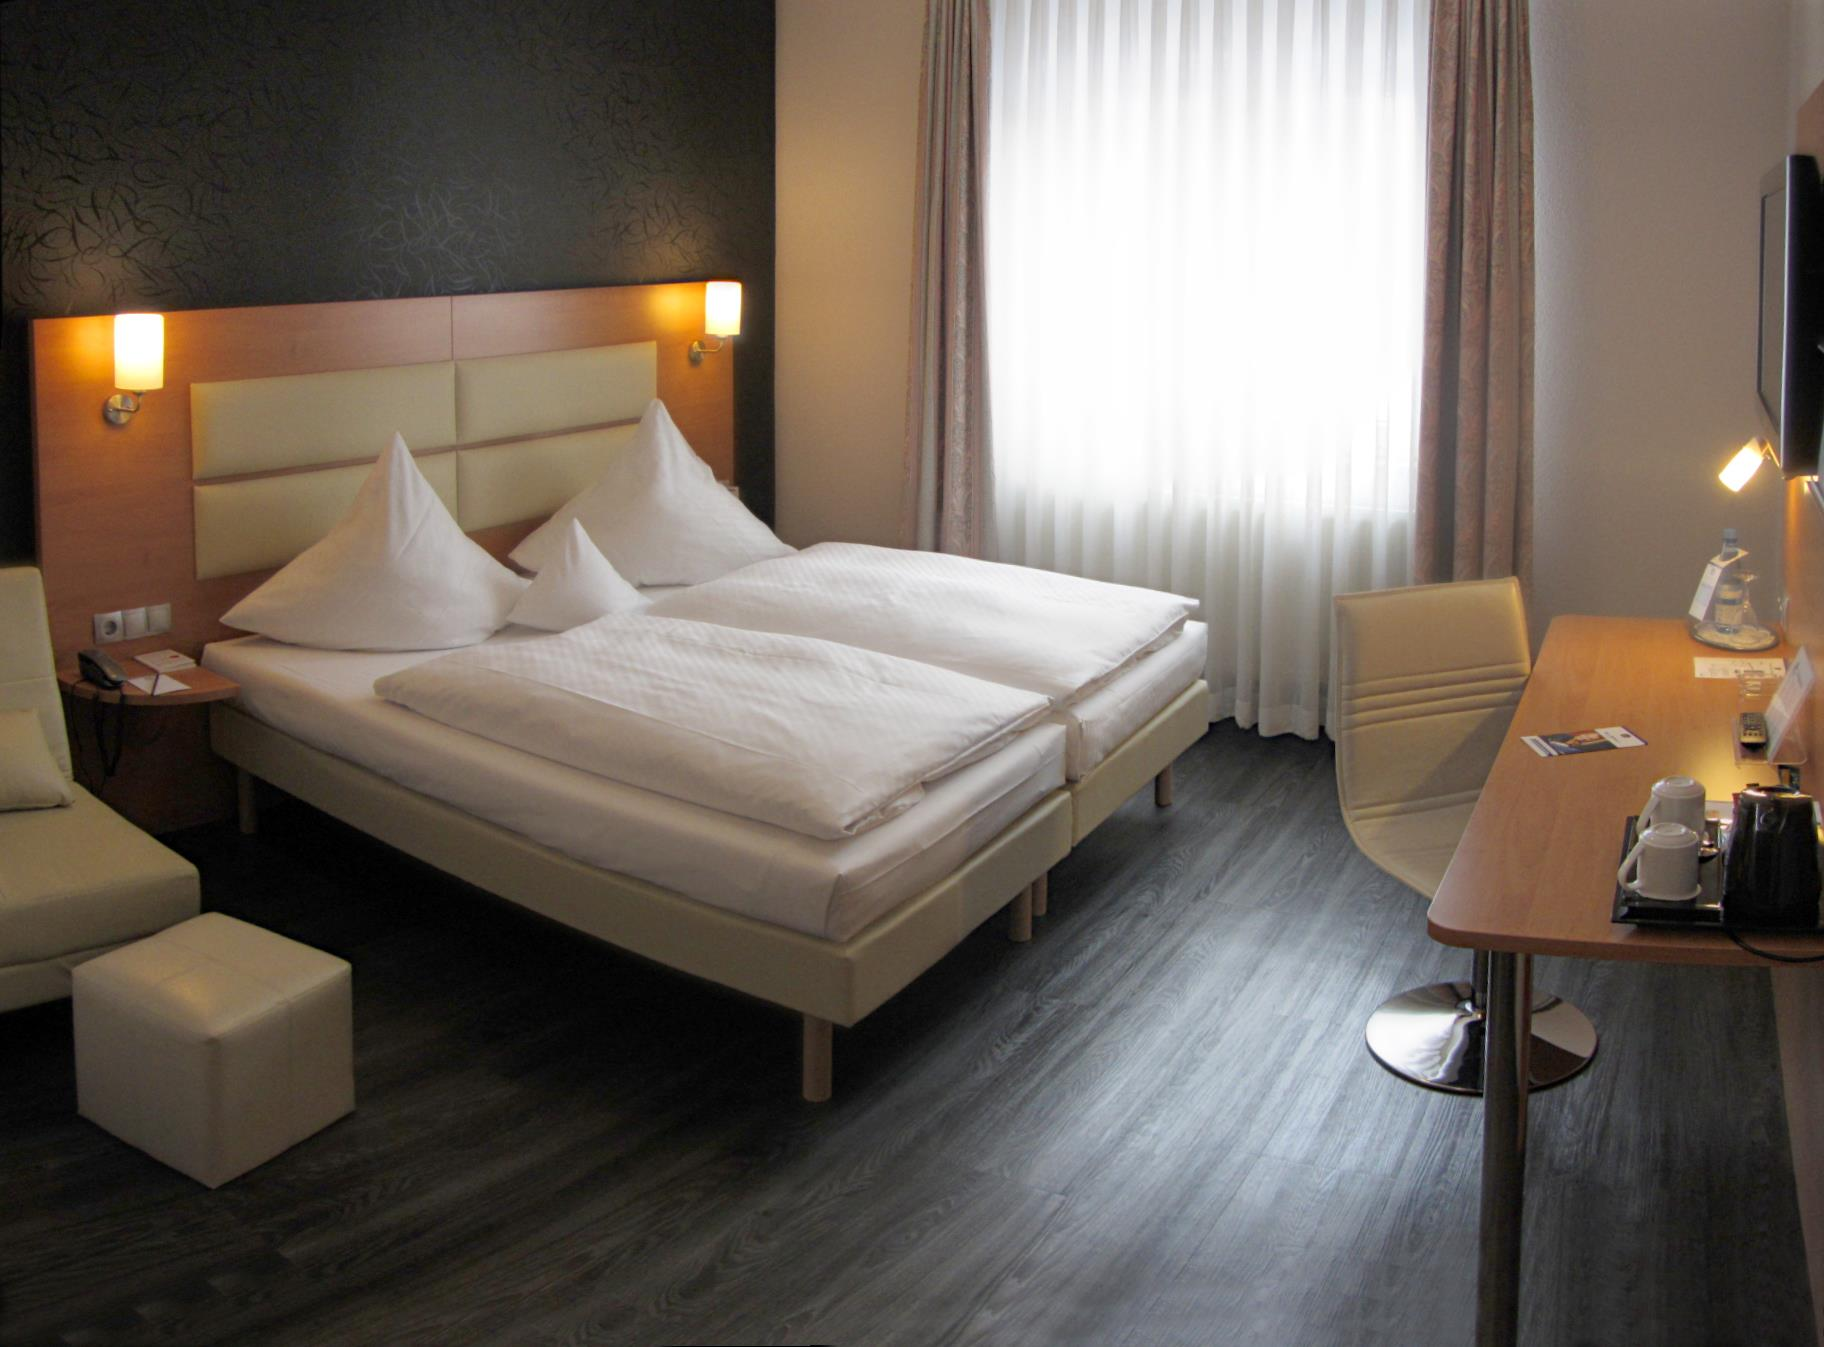 Amh Airport Messe Hotel Gmbh Filderstadt